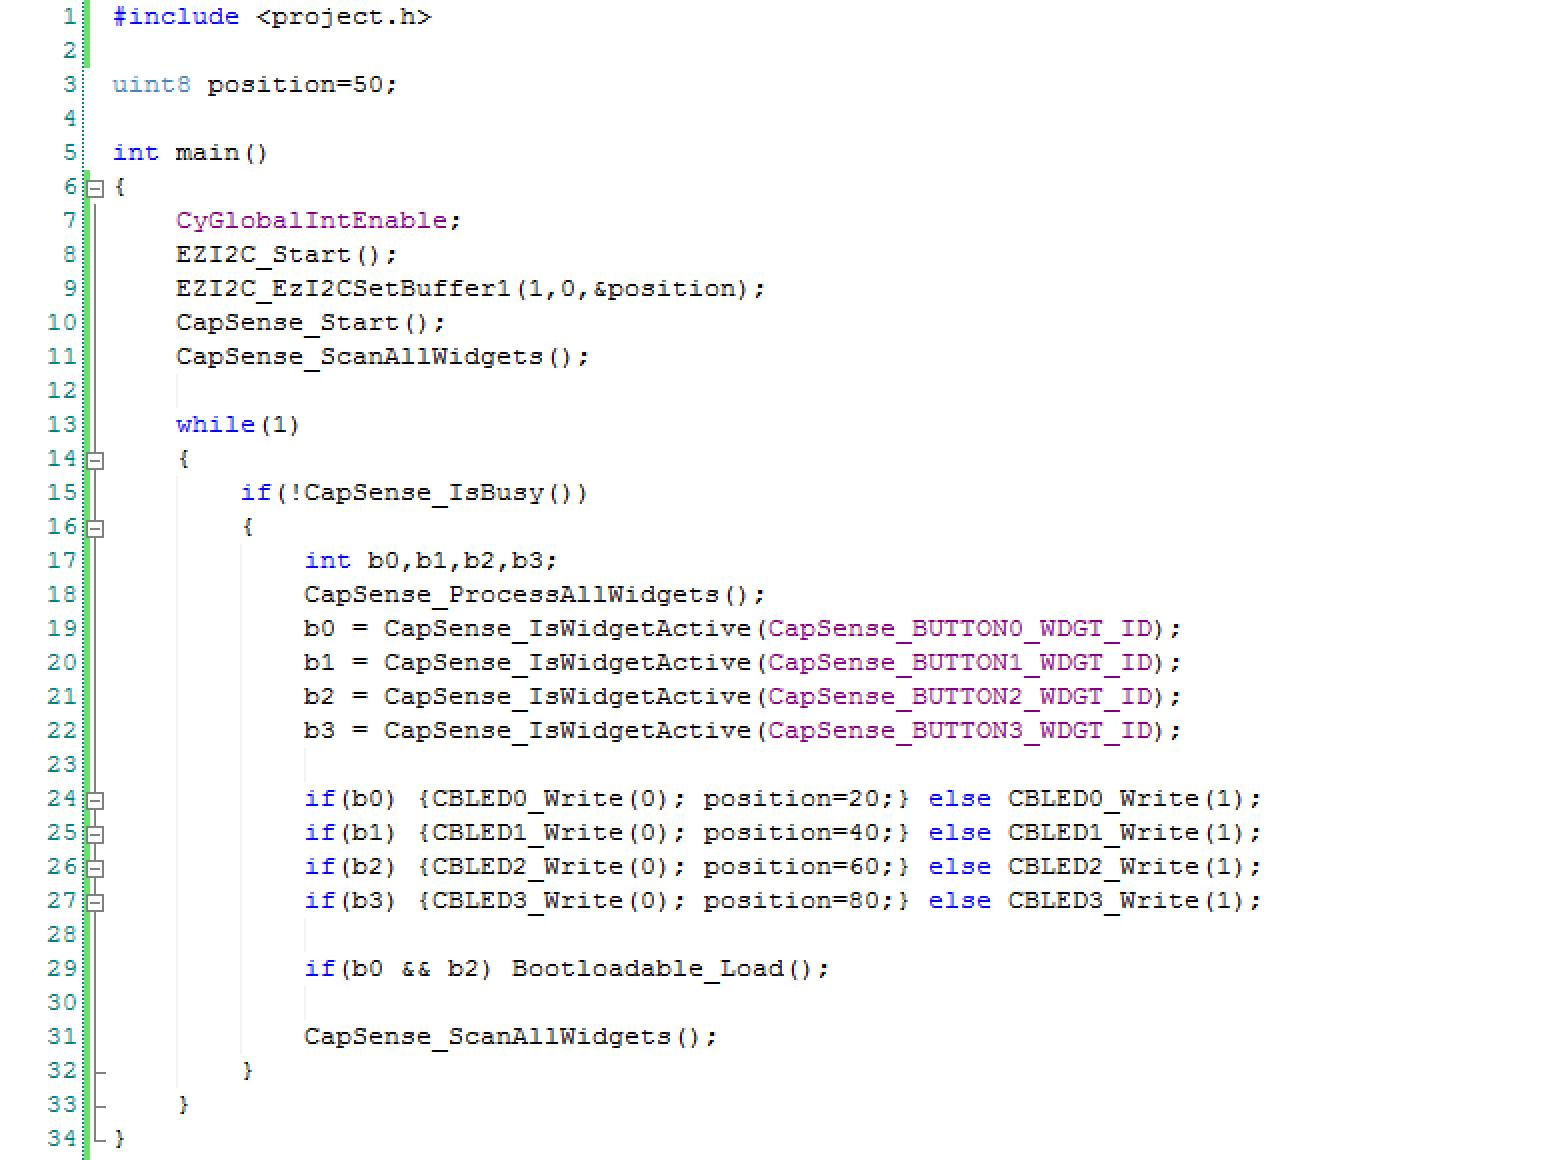 PSoC Analog CoProcessor Main.c